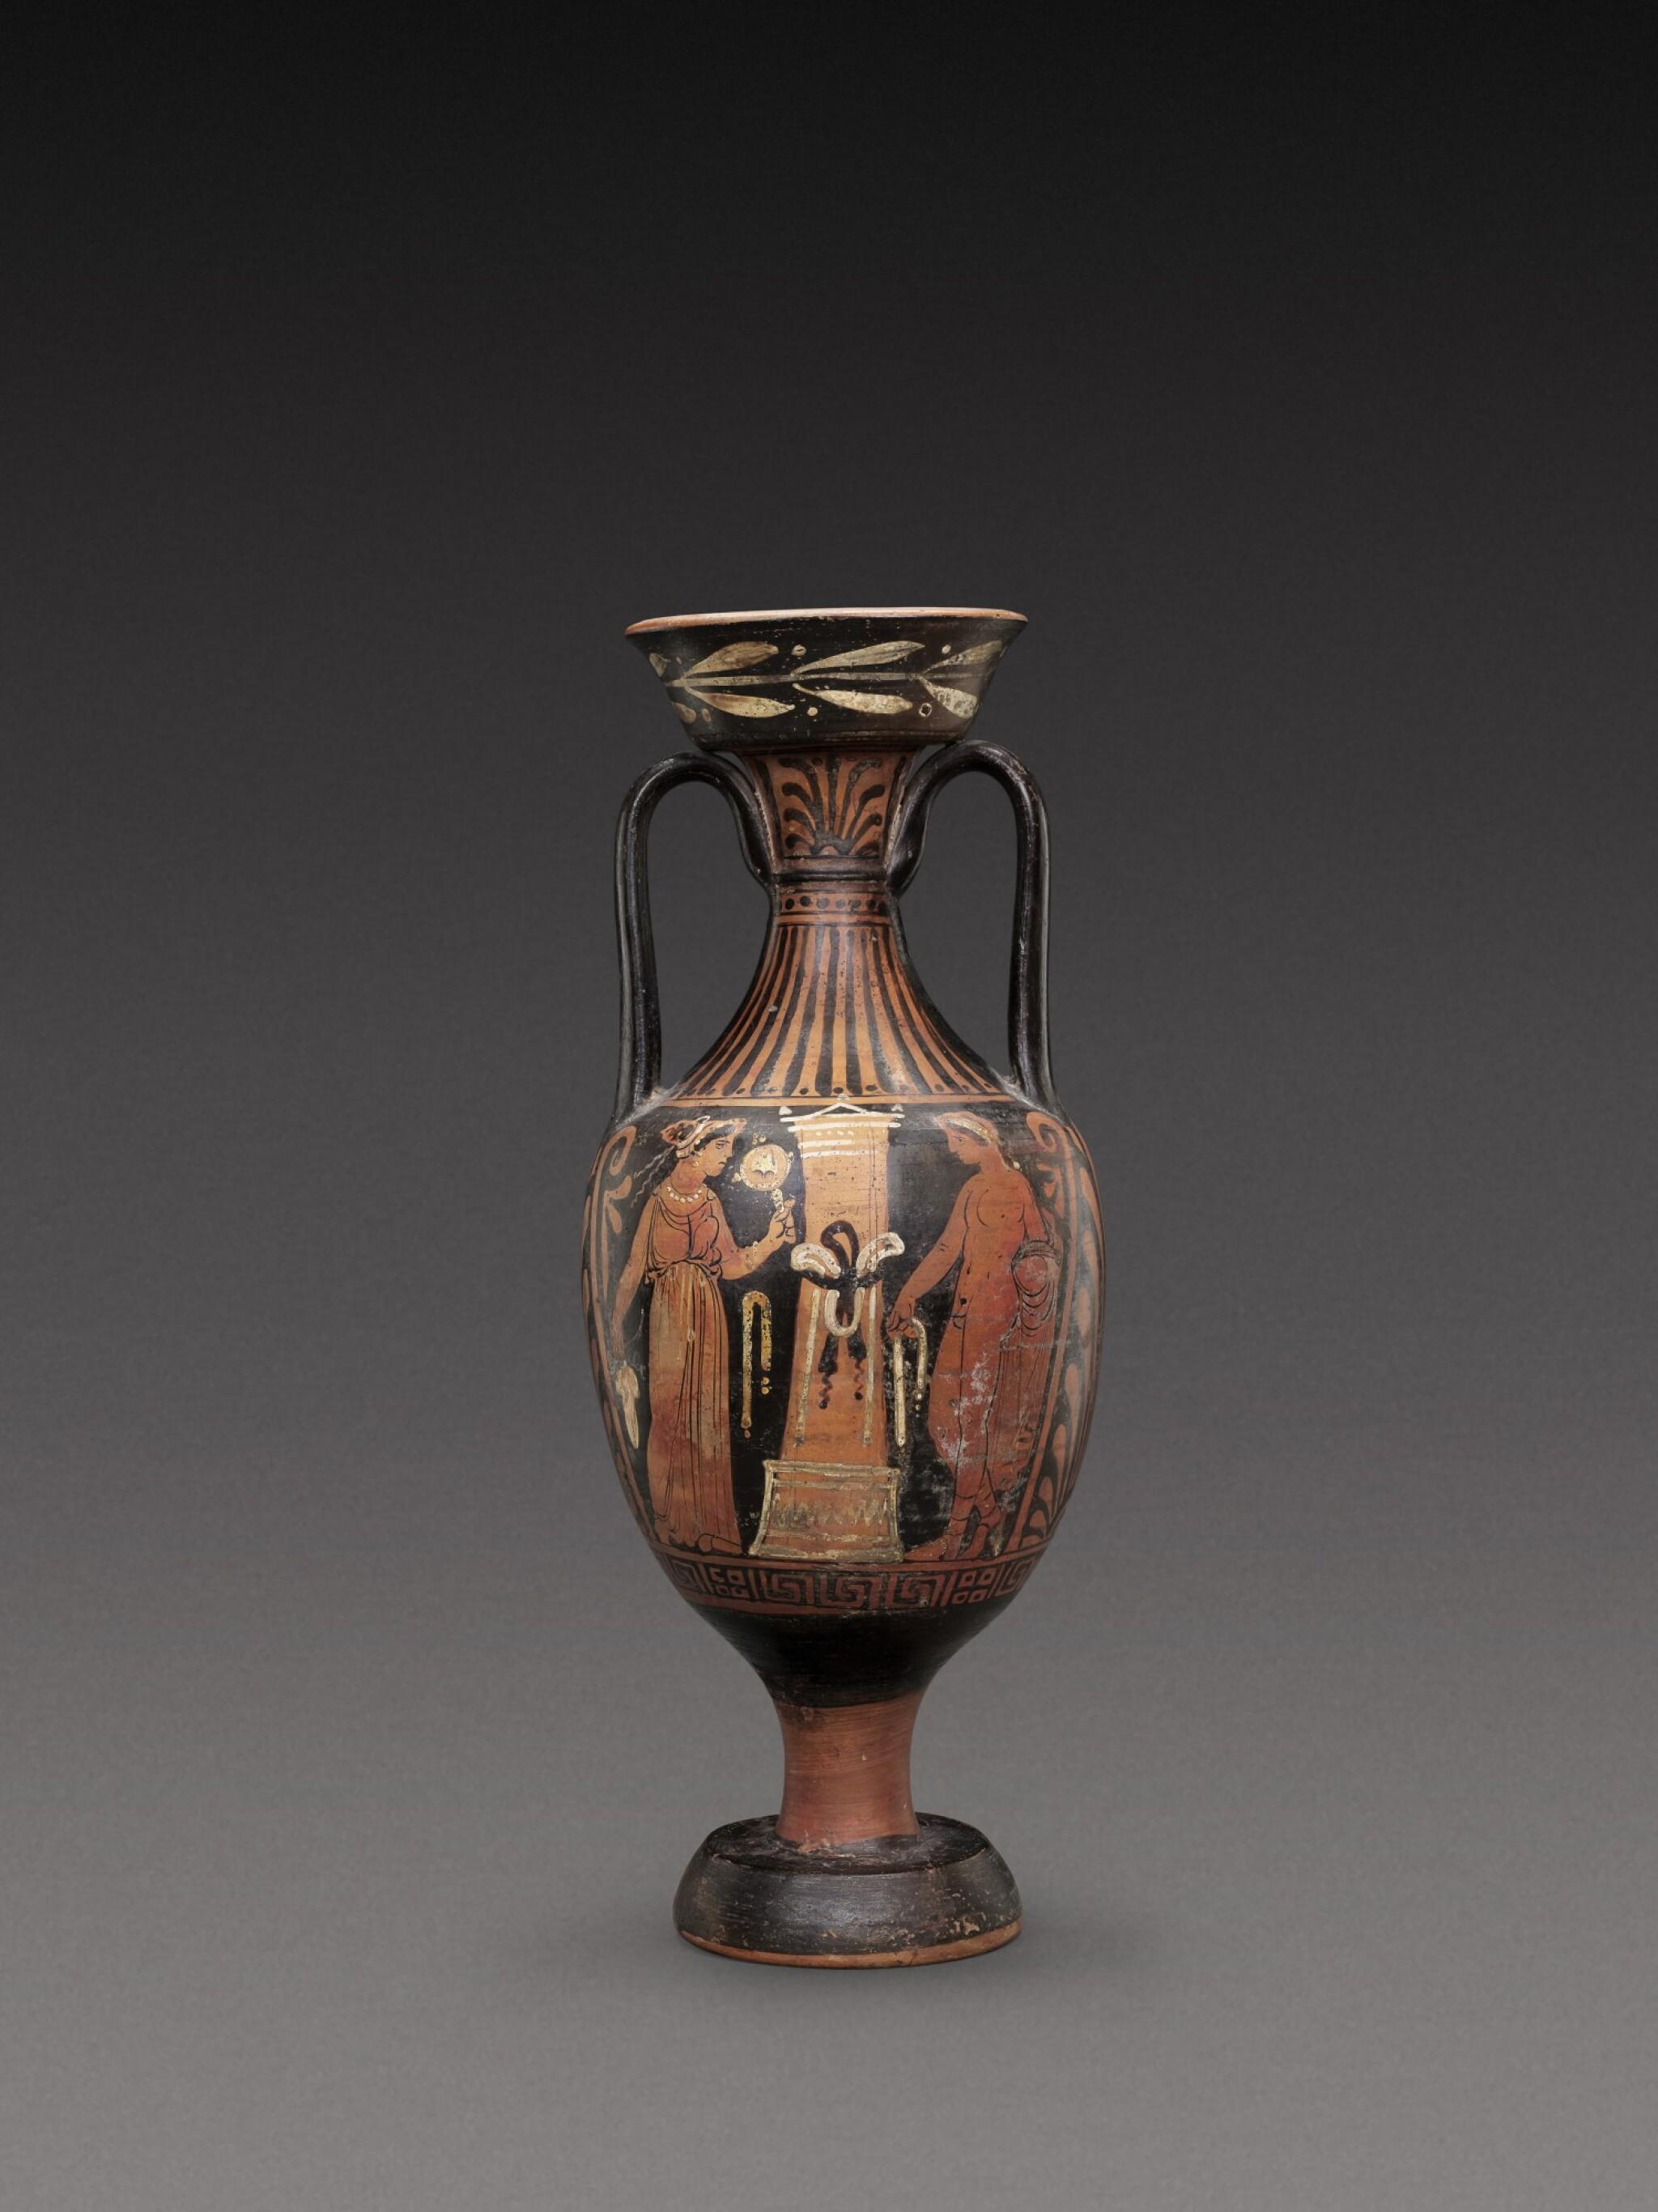 View 1 of Lot 55. An Apulian Red-figured Amphora, circa 350-330 B.C..